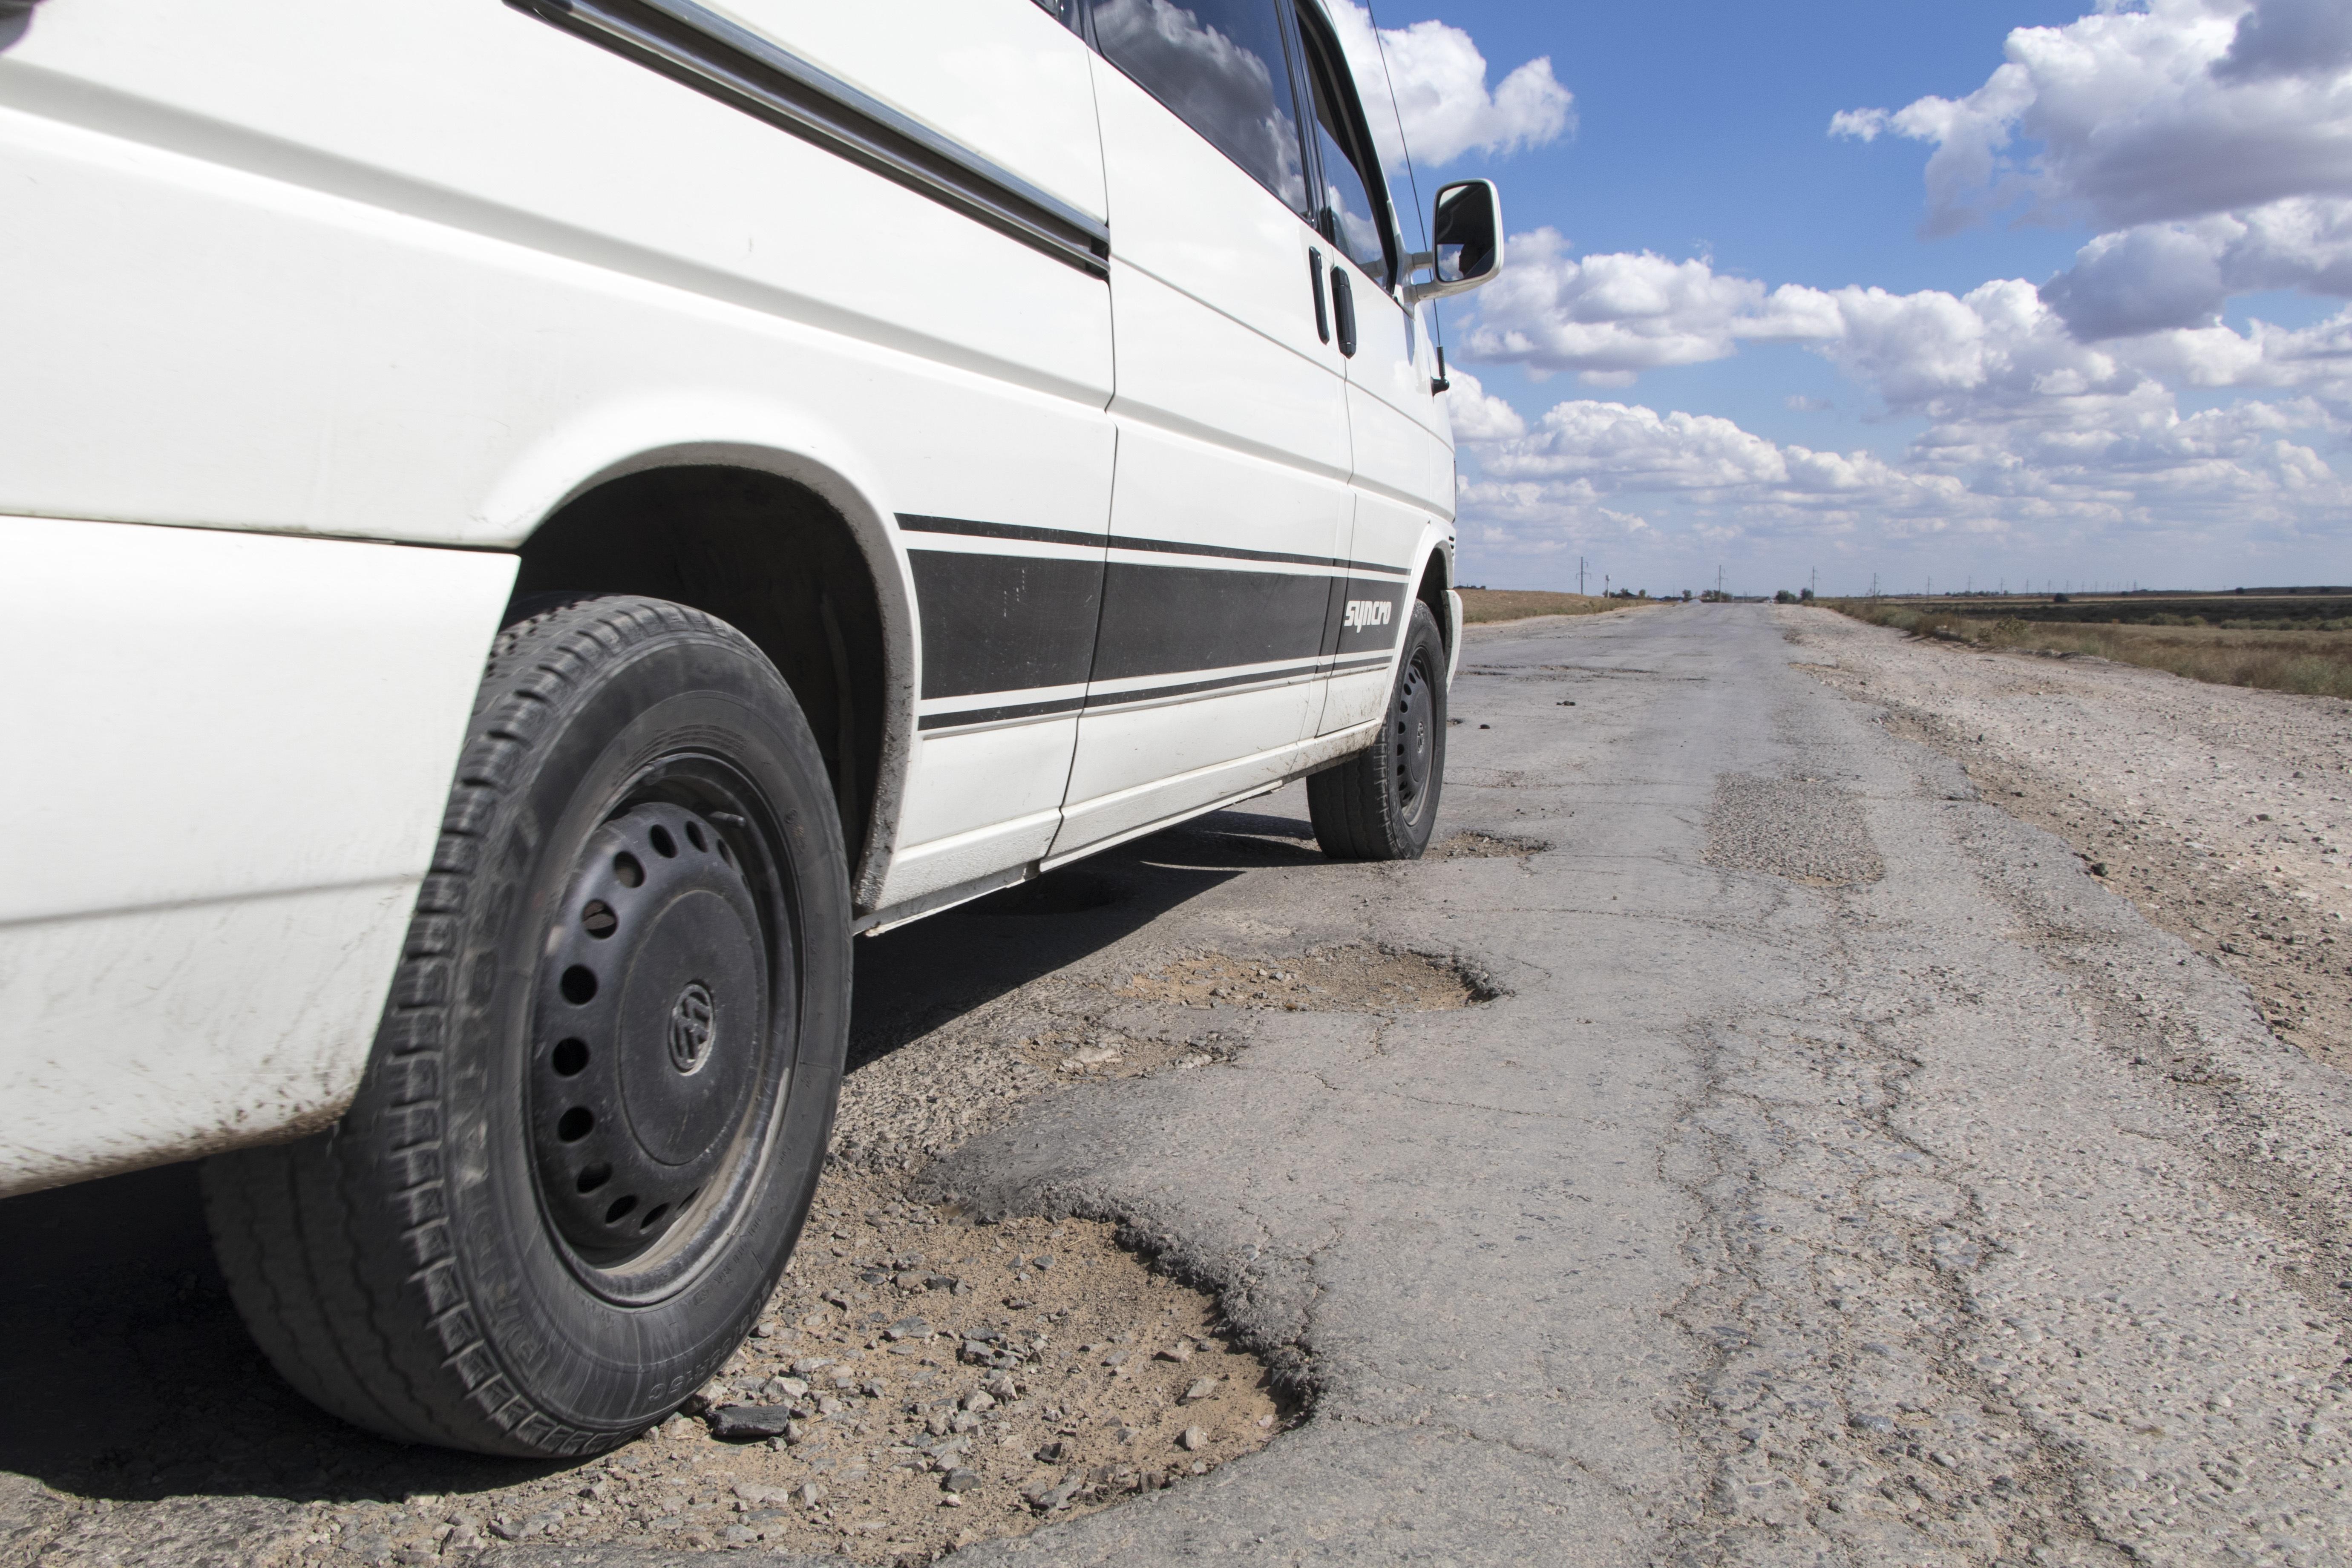 road-car-hole-volkswagen-van-asphalt-481555-pxhere.com.jpg